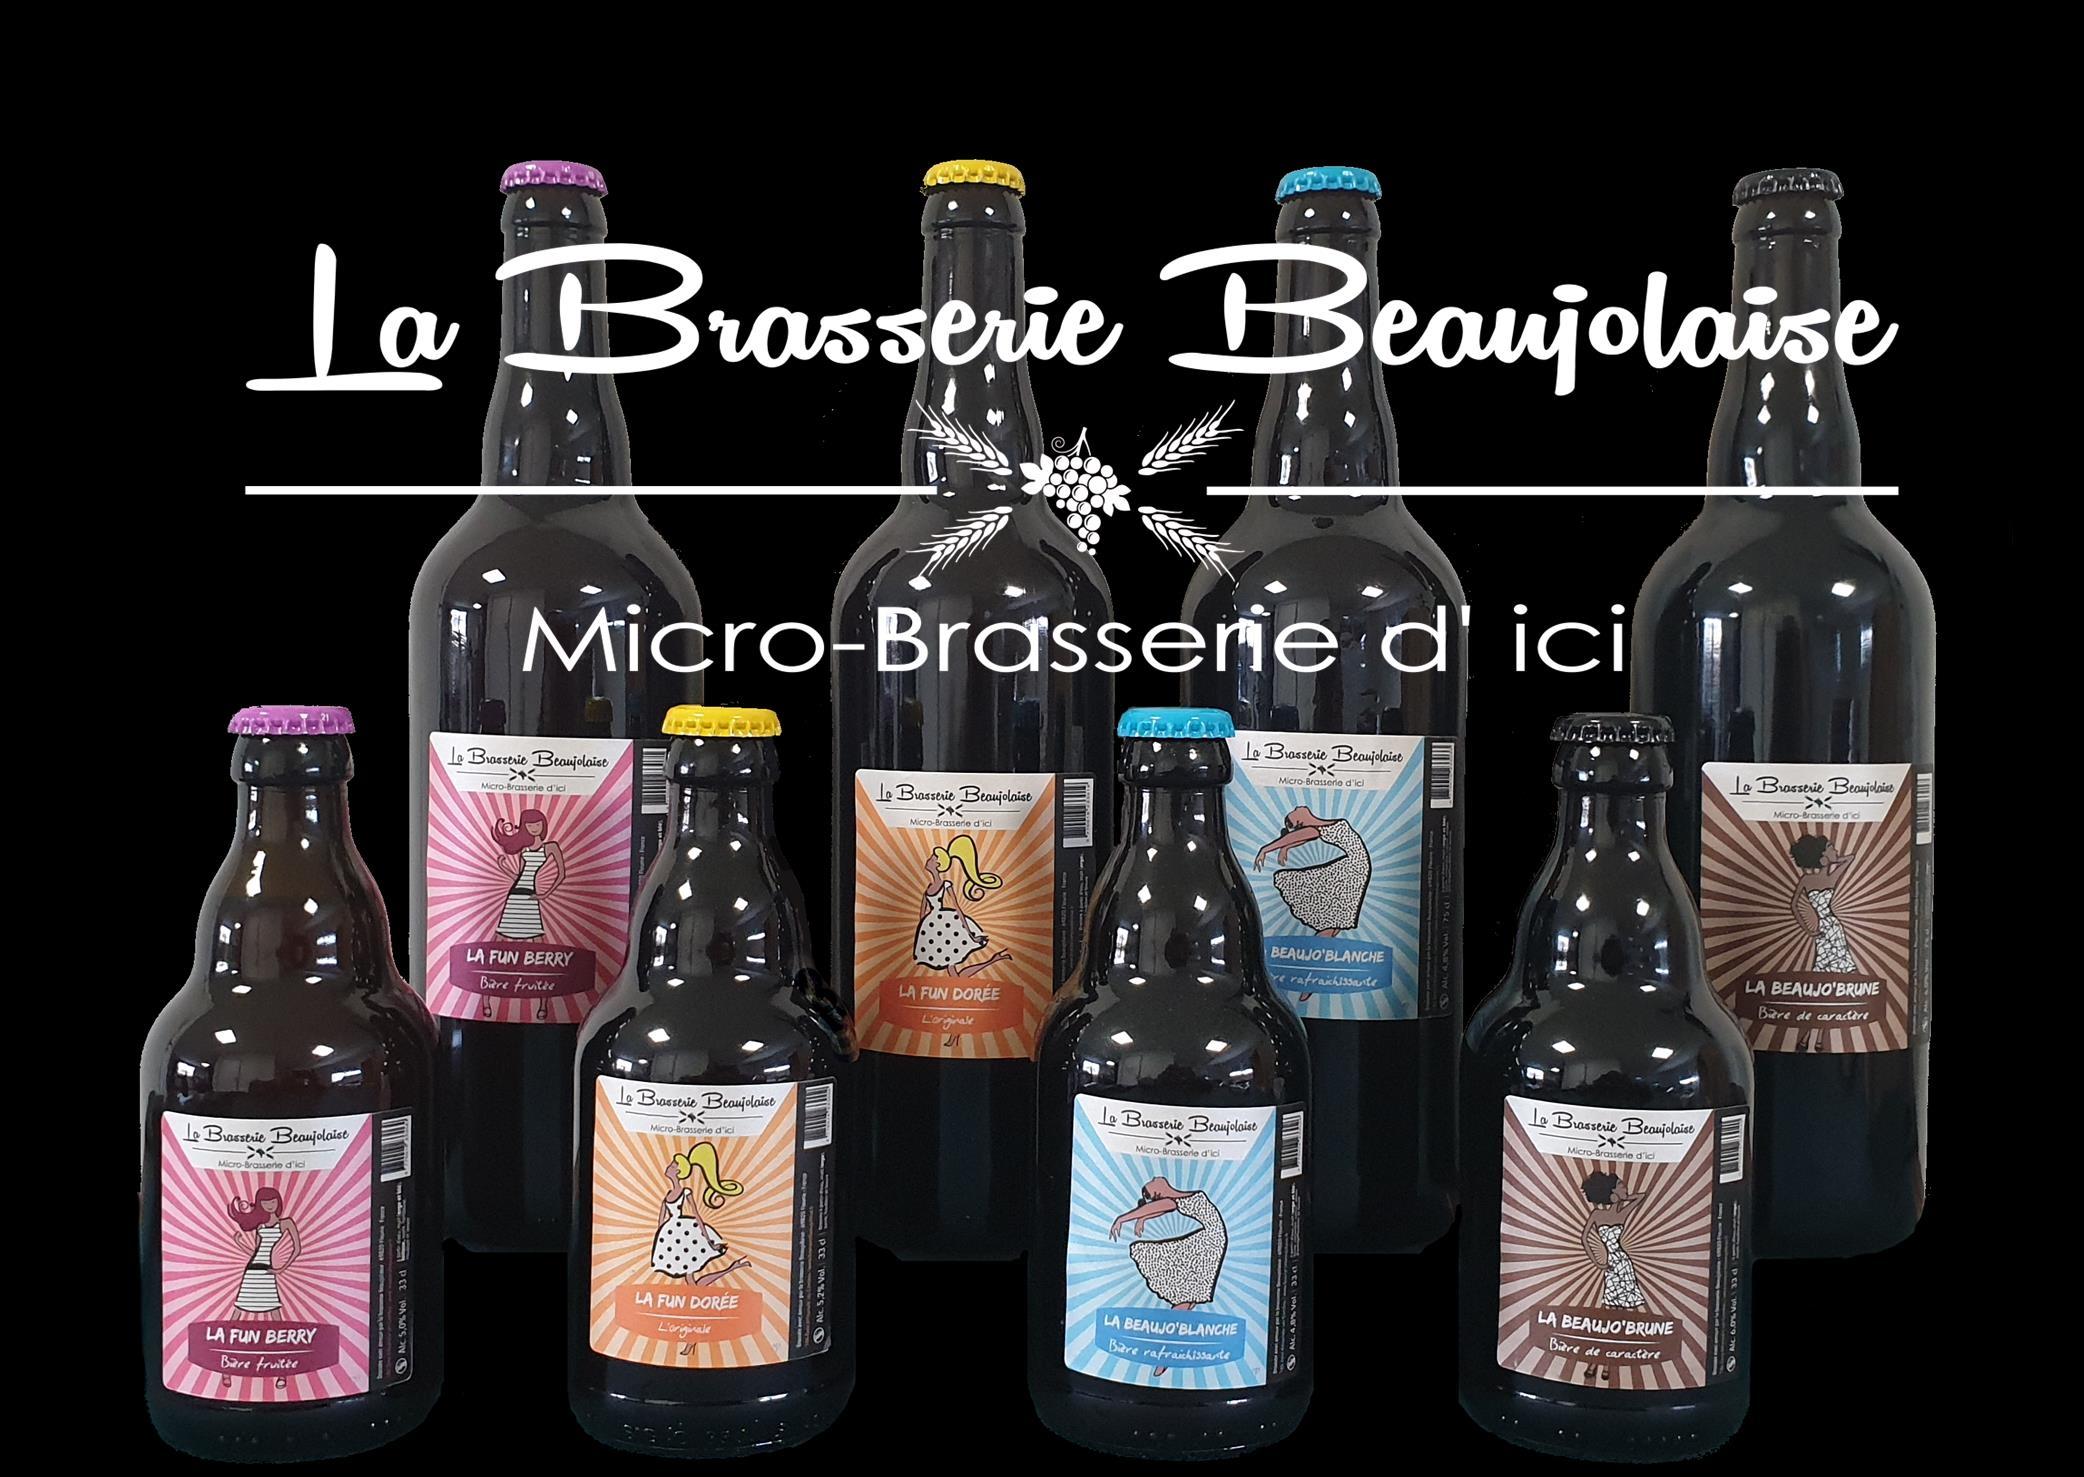 Galerie d'image - La Brasserie Beaujolaise